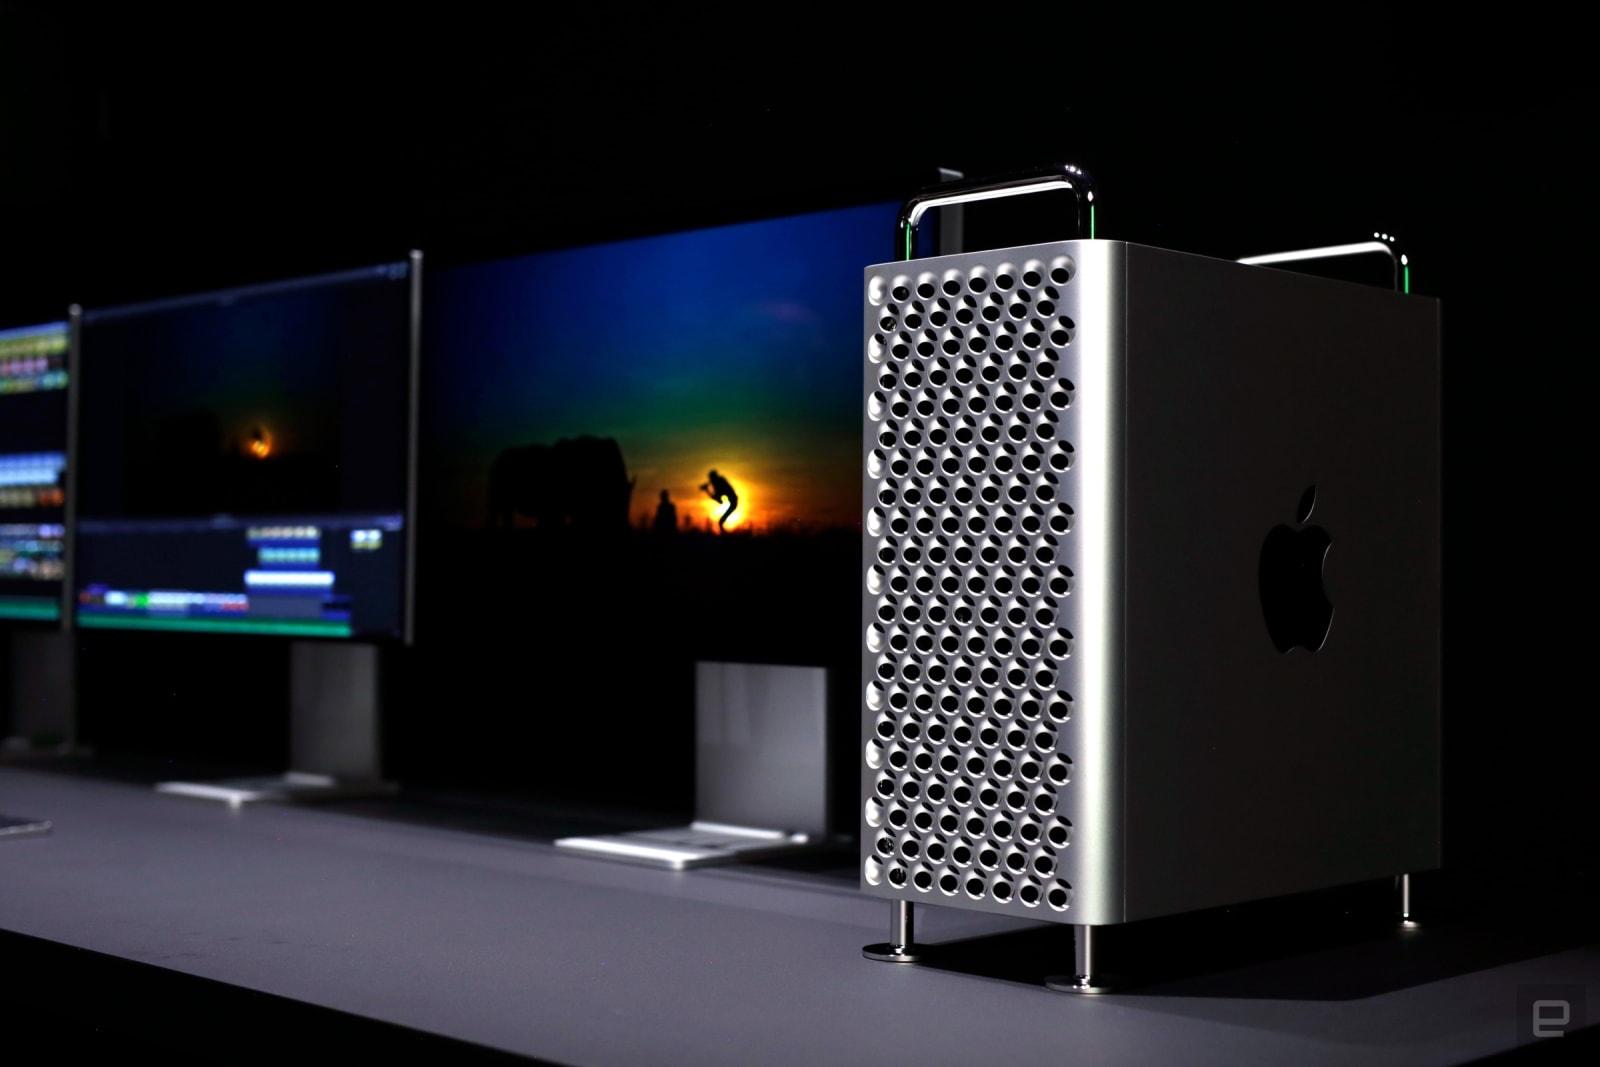 President Trump will visit Apple's Mac Pro factory on November 20th